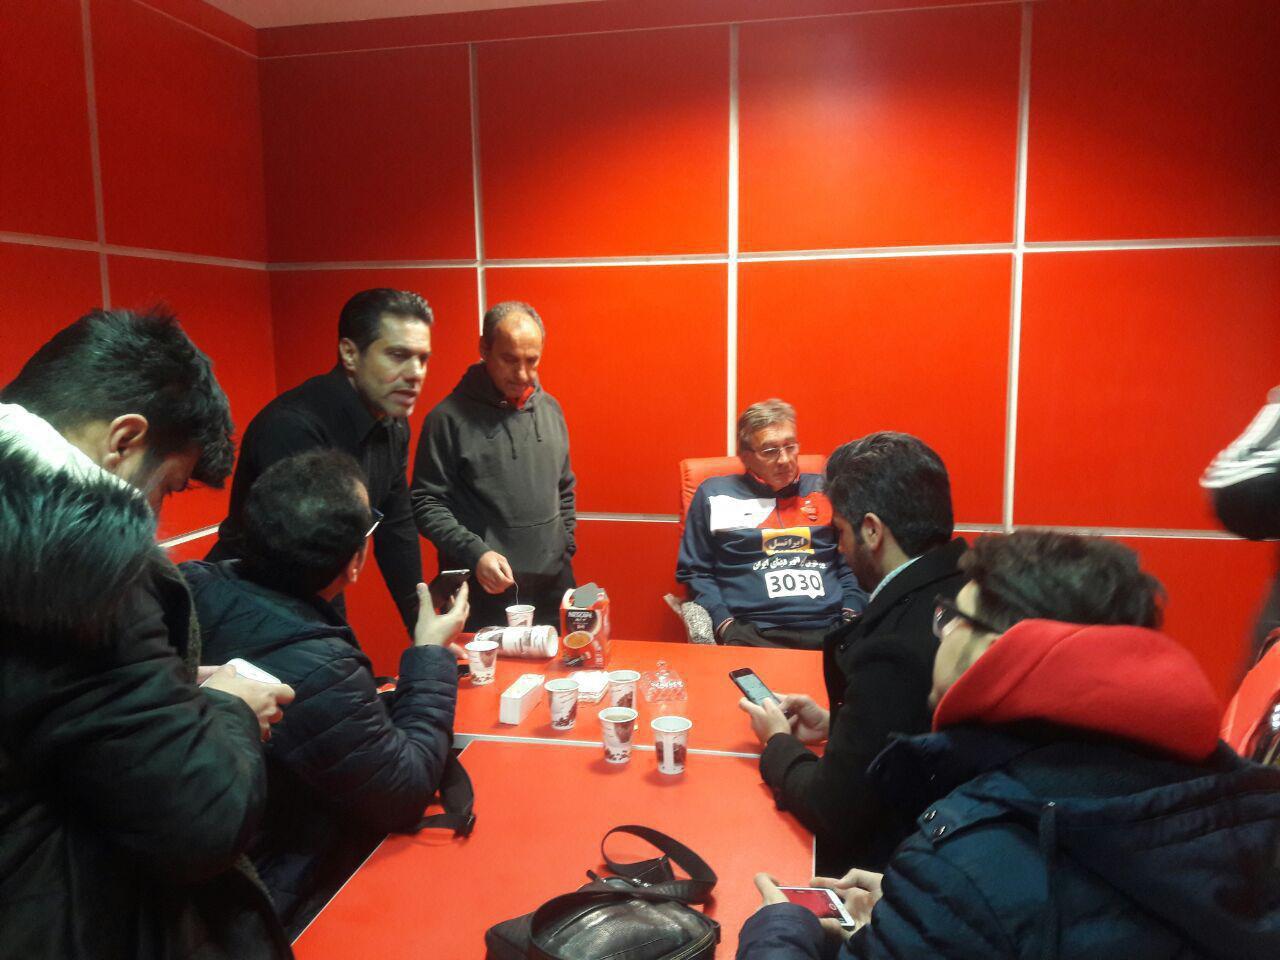 عکس| نشست صمیمانه برانکو با خبرنگاران